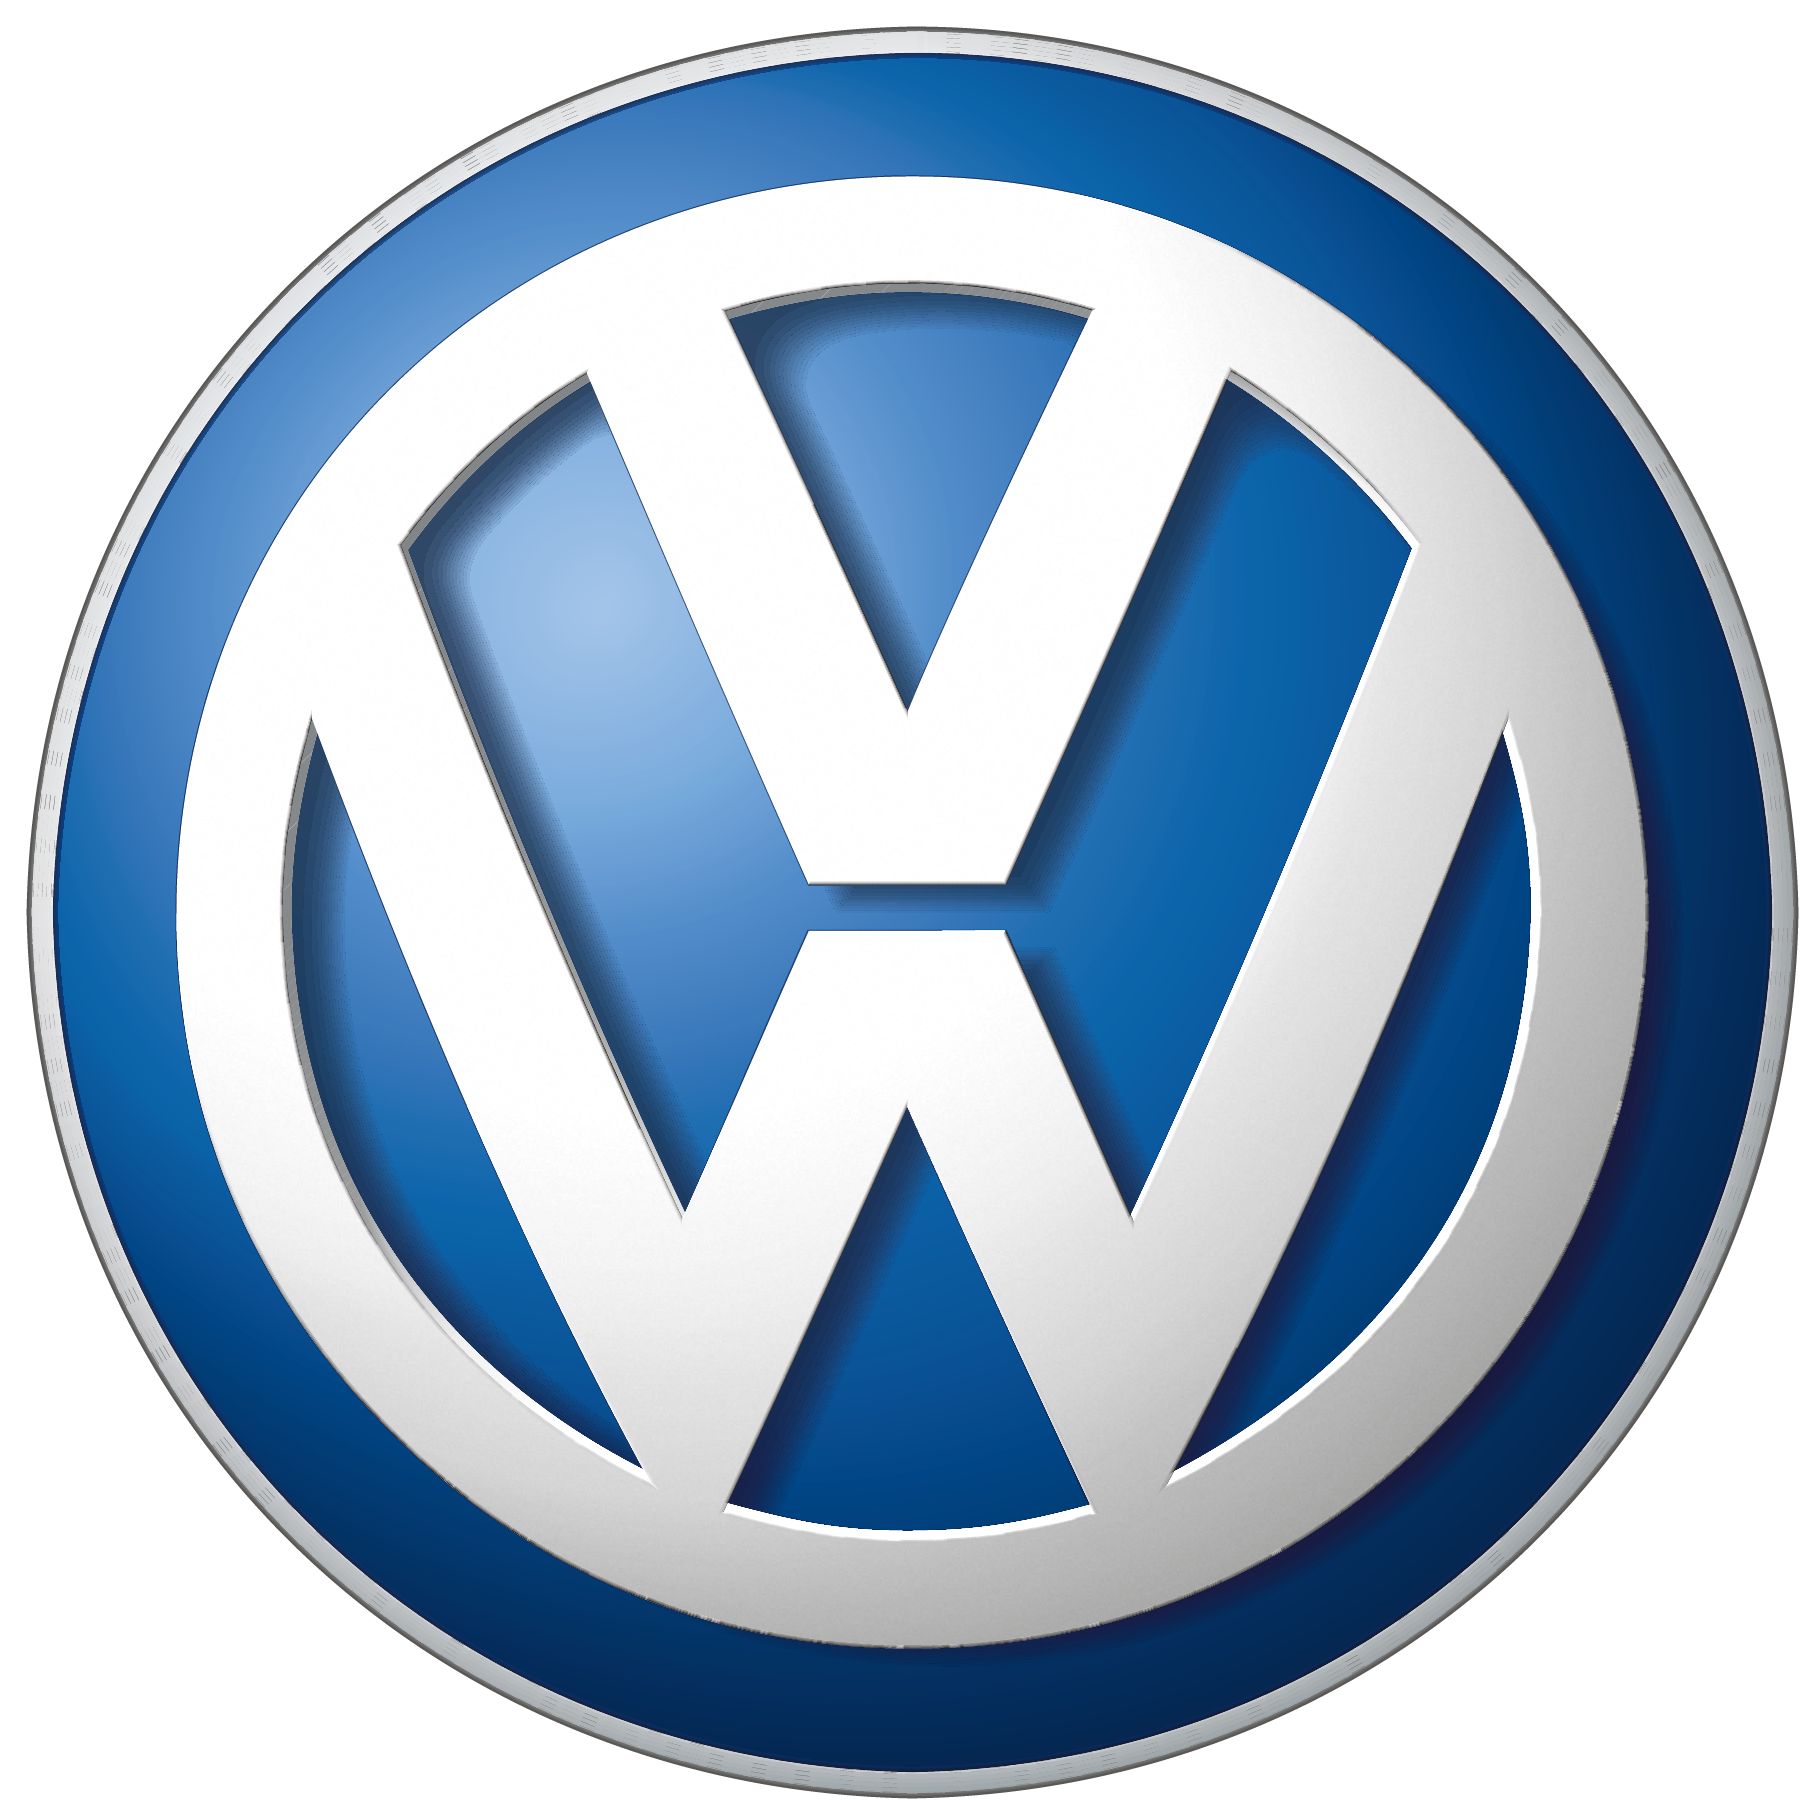 Volkswagen car logo PNG brand image.